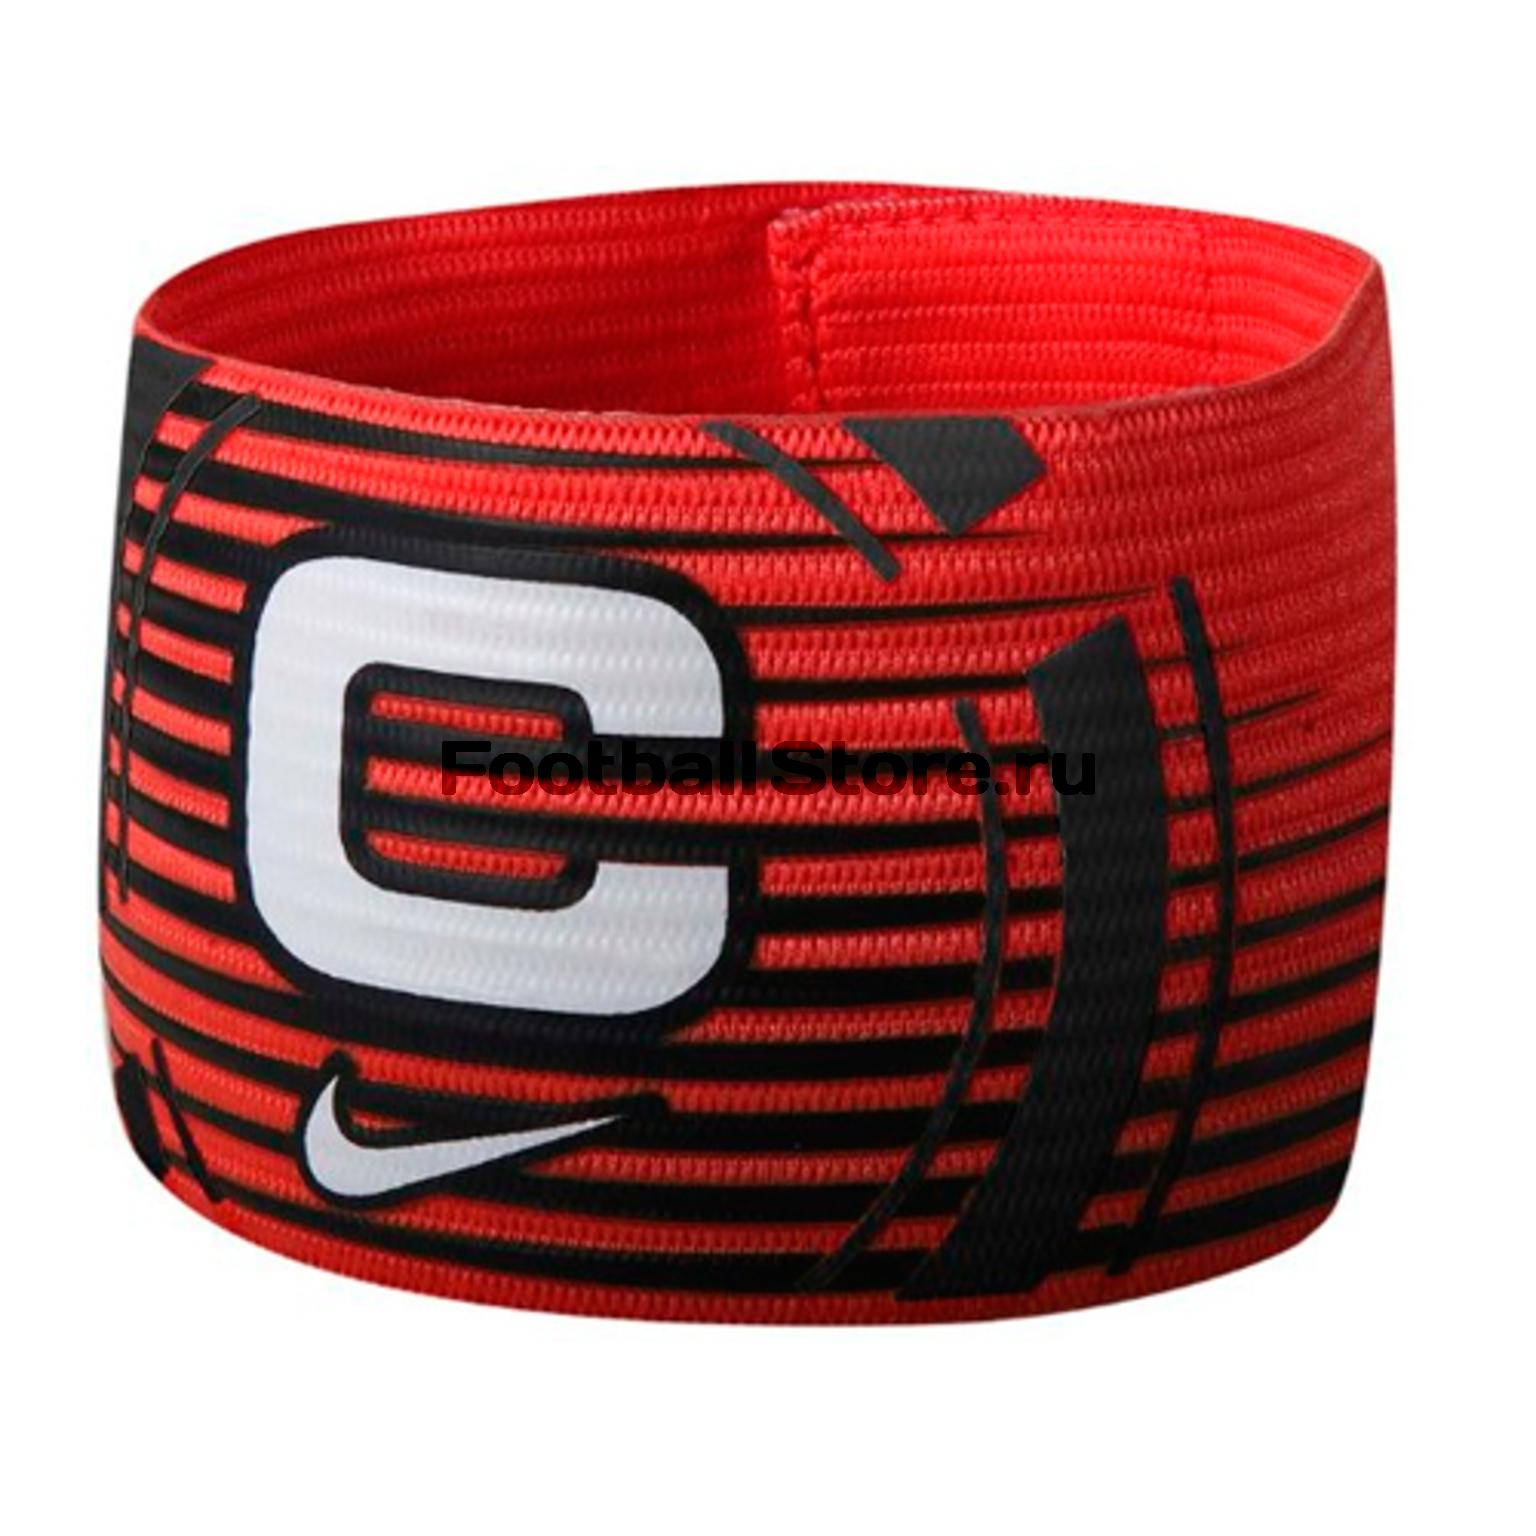 Повязки/Напульсники Nike Повязка Nike Footboll Arm Band N.SN.02.602.NS